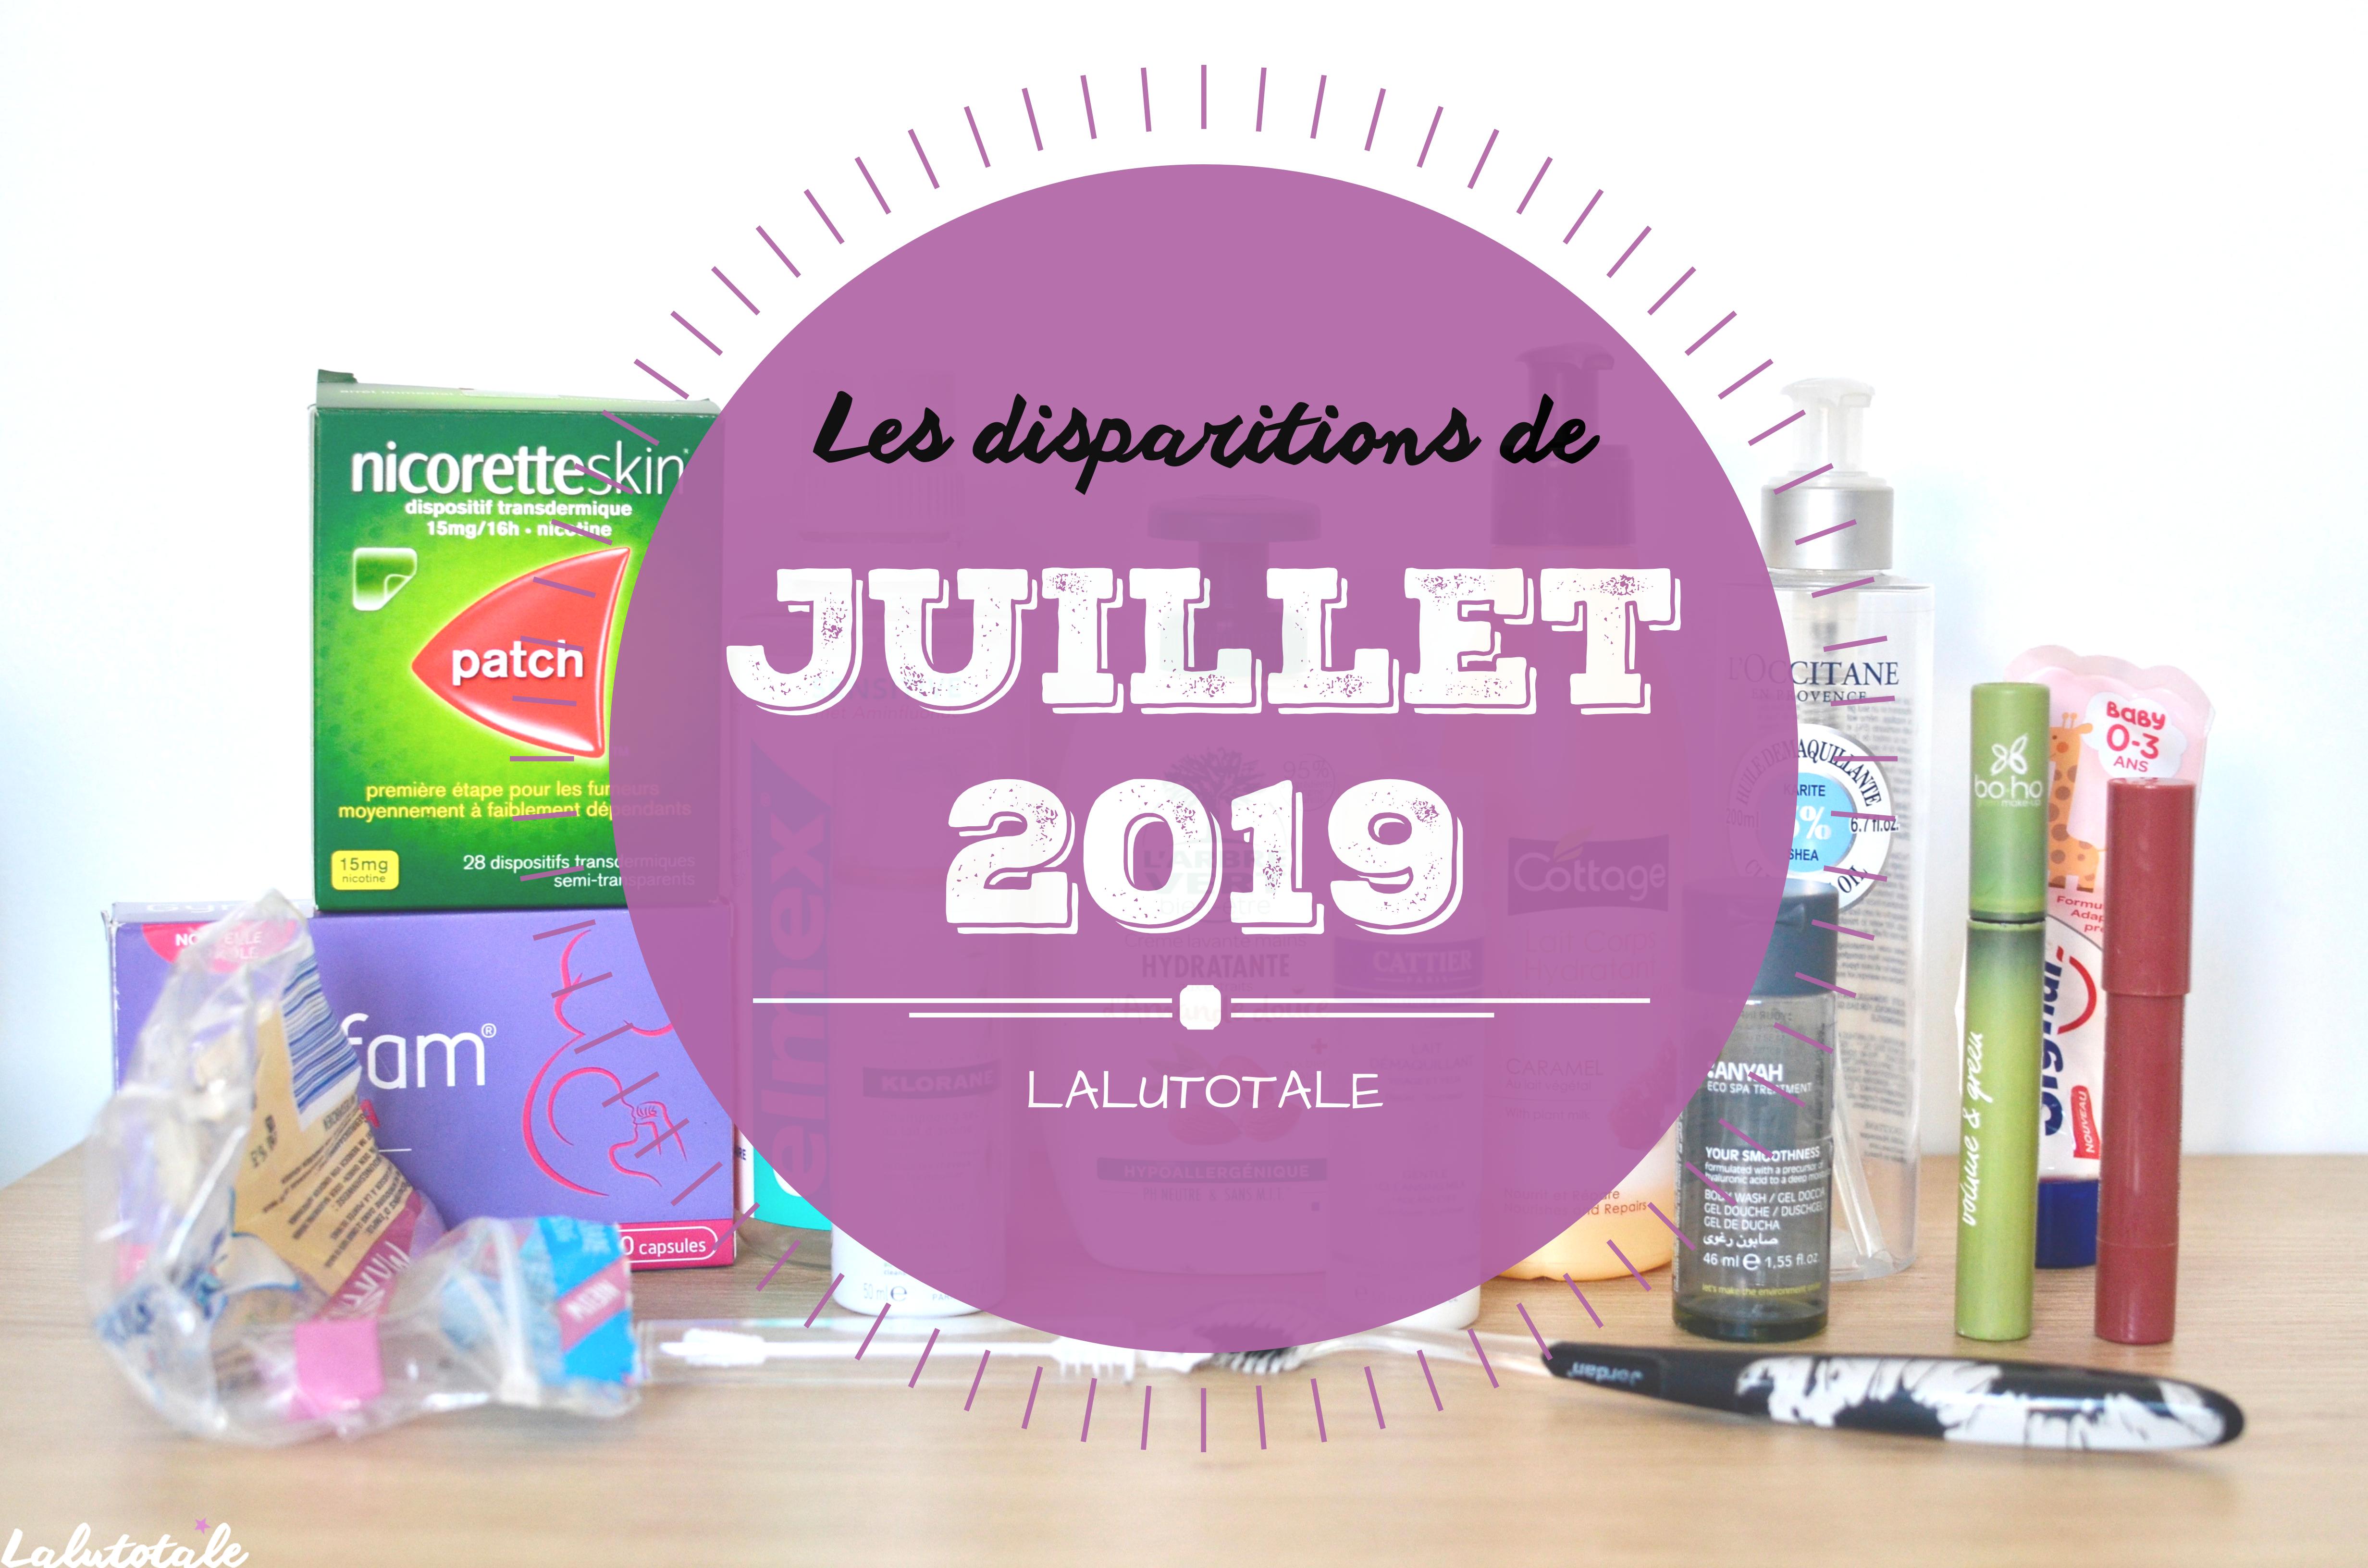 ✞ Les disparitions de Juillet 2019 ✞